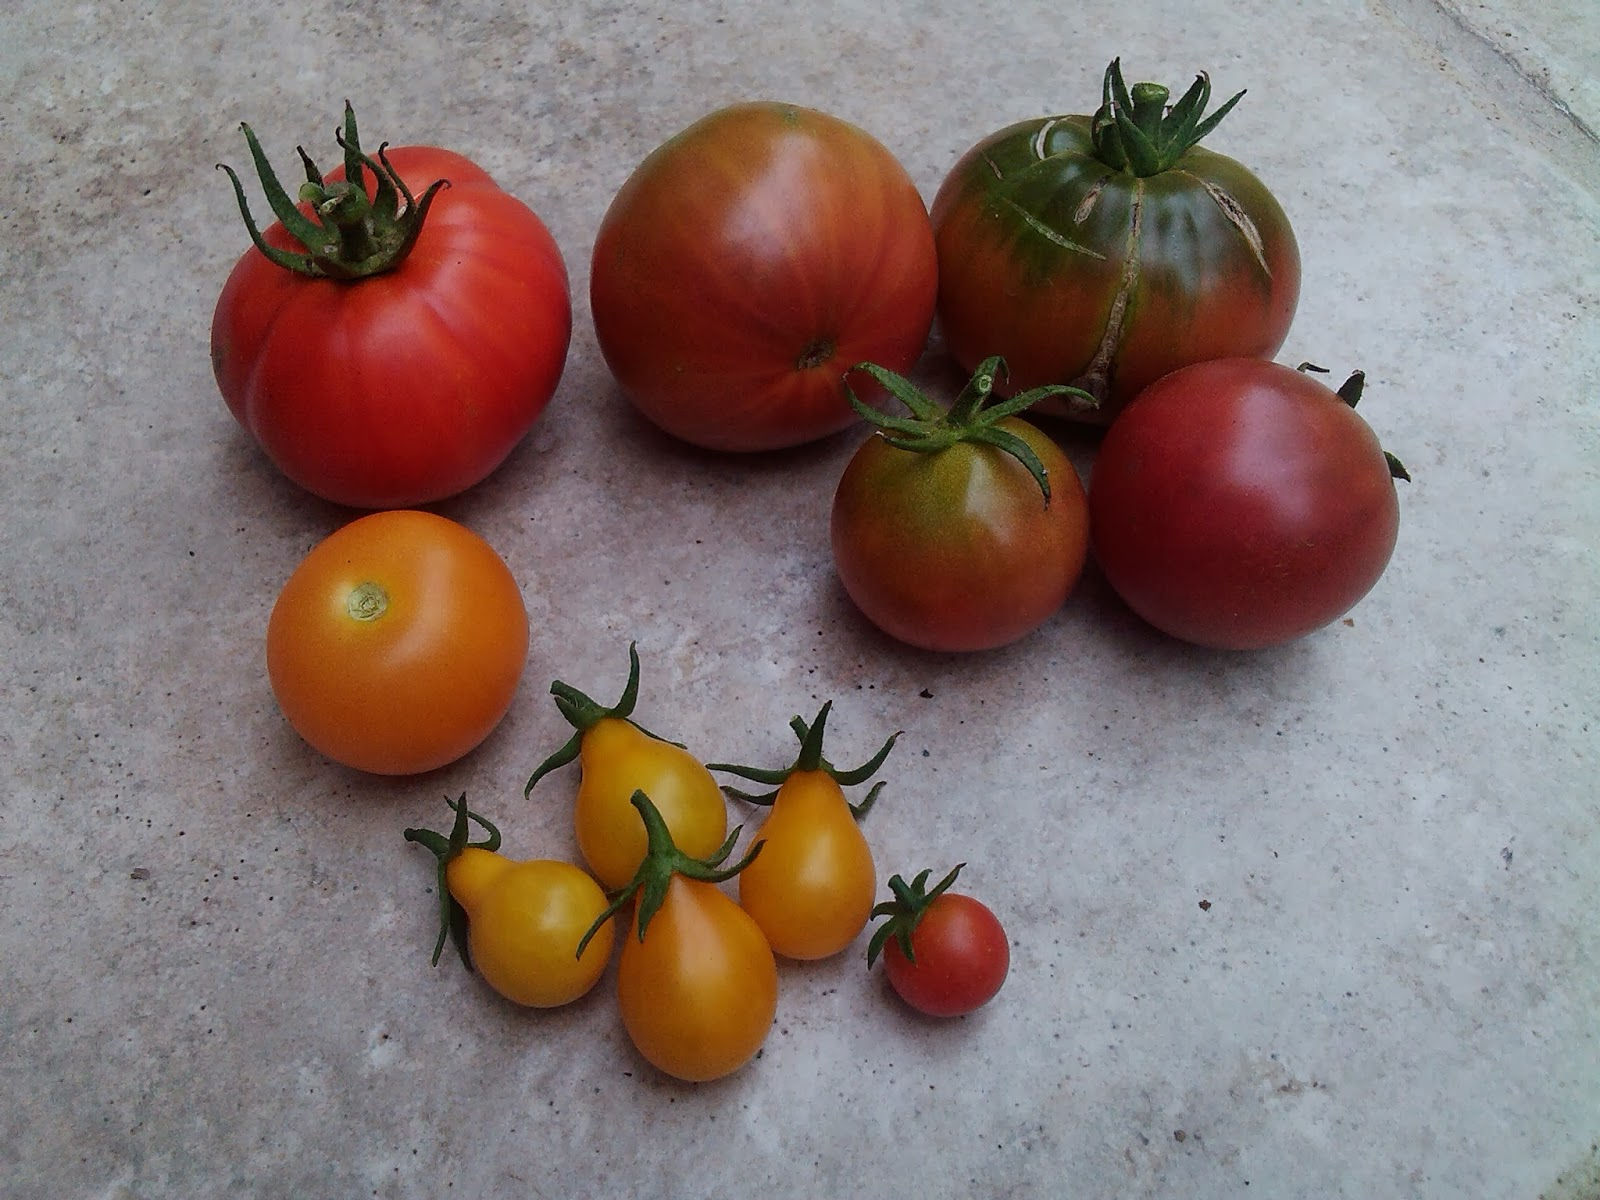 le potager d 39 aur lie qu 39 elle vari t de tomates chosir. Black Bedroom Furniture Sets. Home Design Ideas